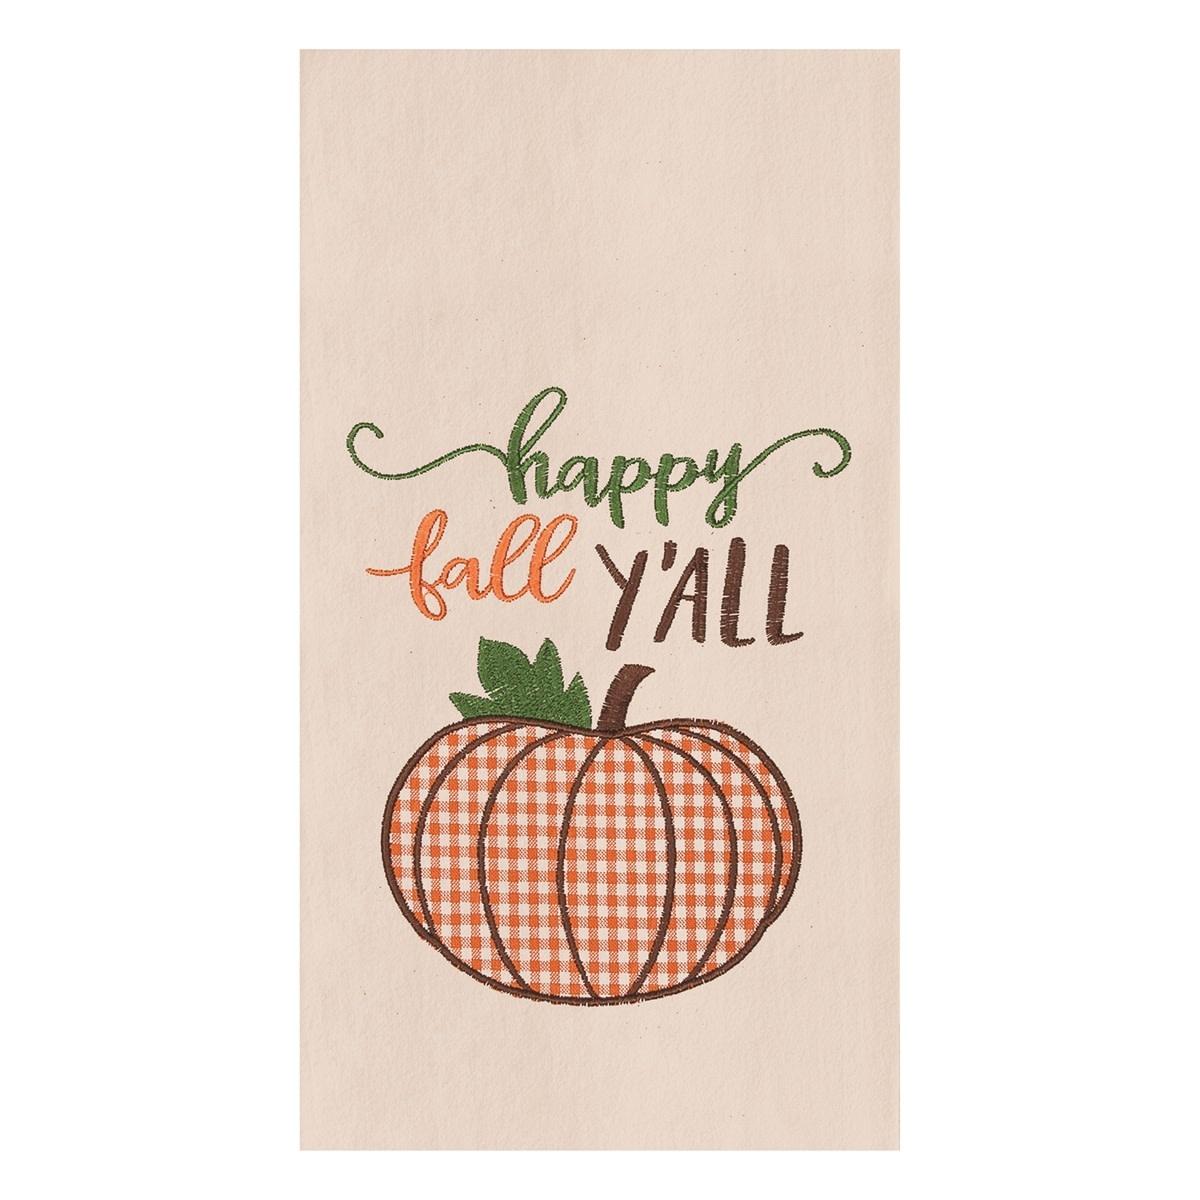 Happy Fall Y'all Pumpkin Towel